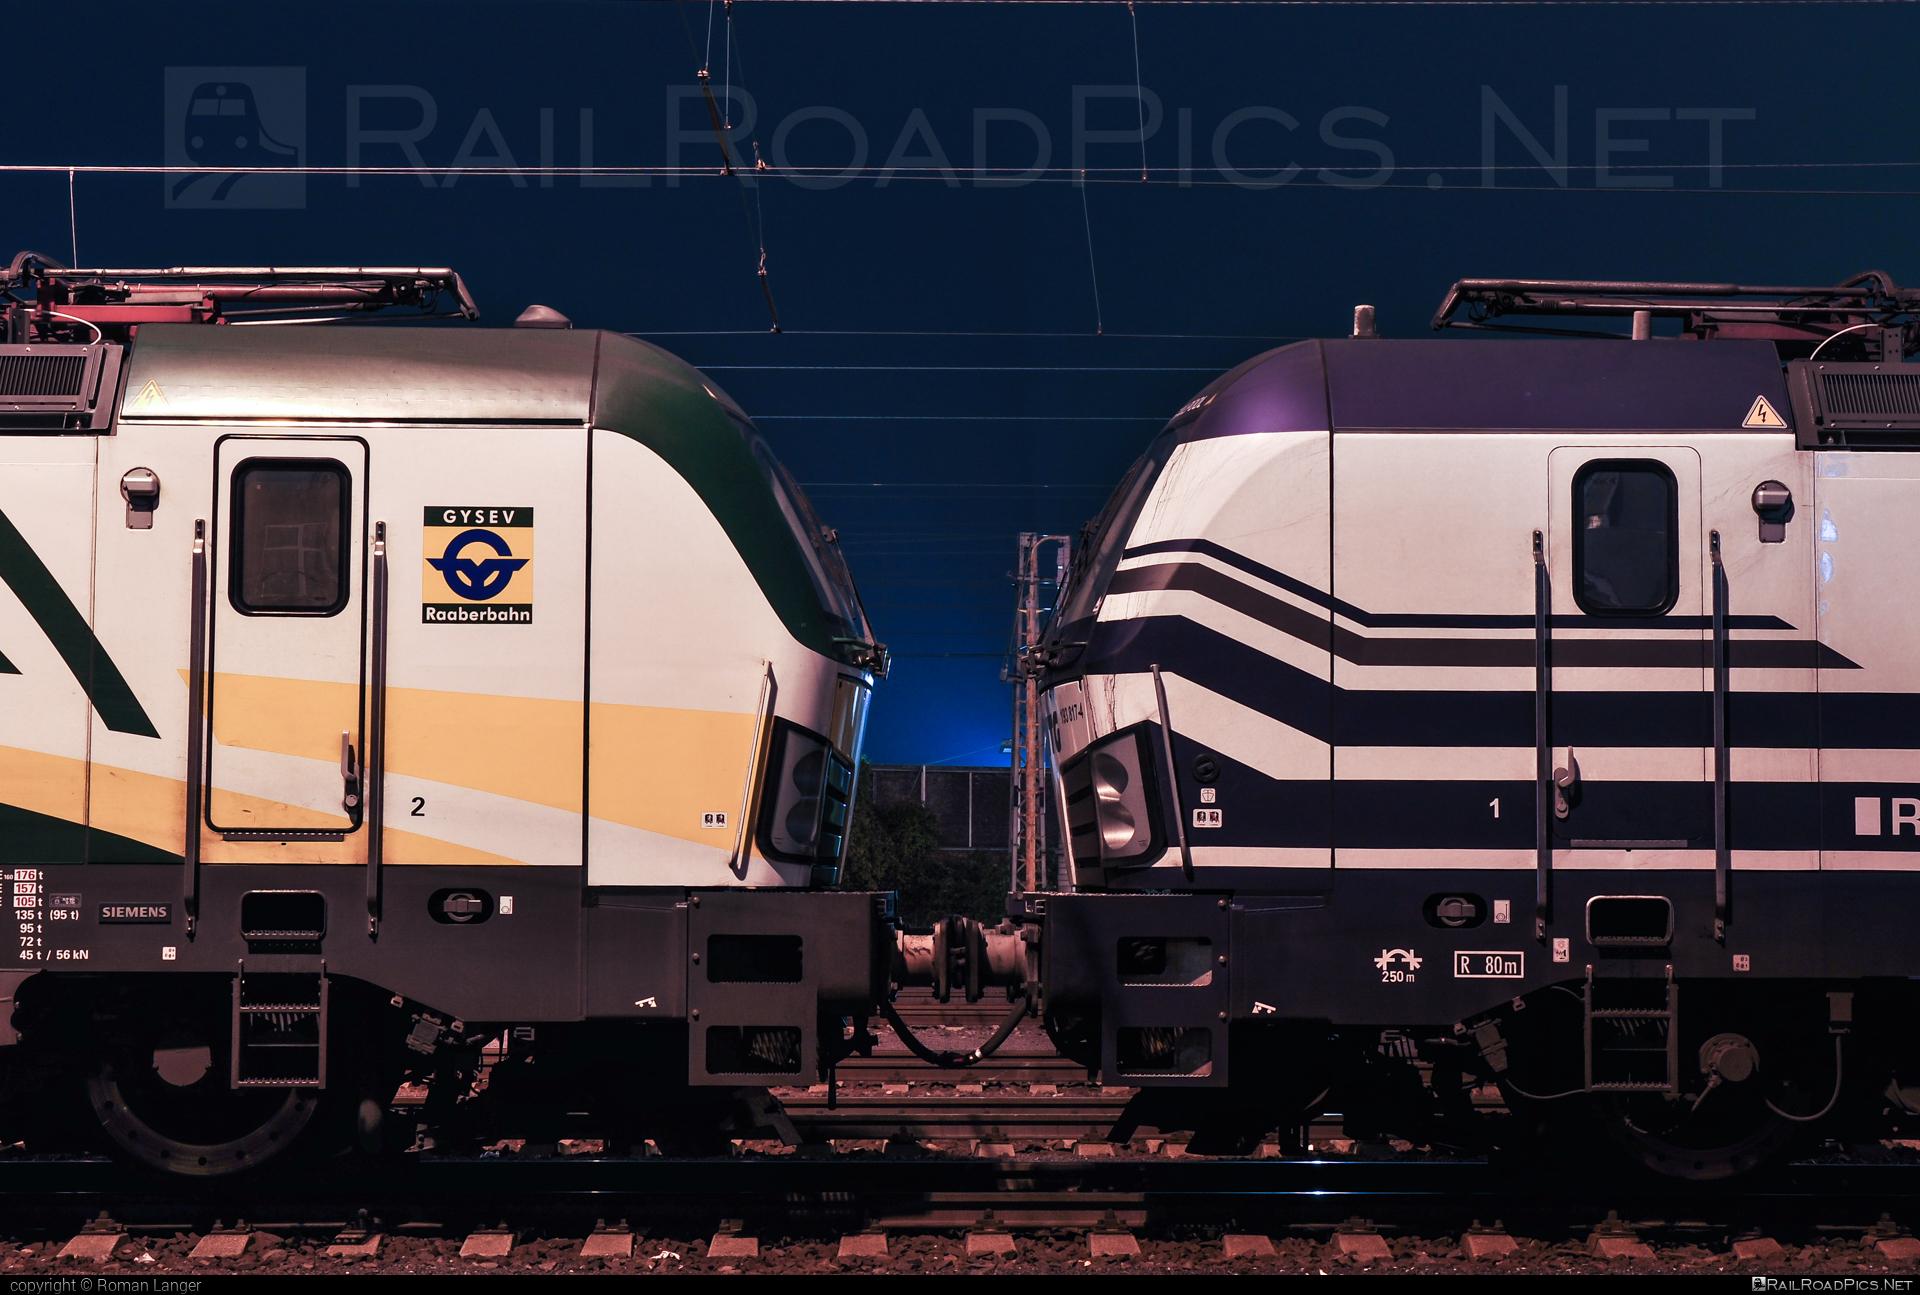 Siemens Vectron AC - 471 001 operated by Wiener Lokalbahnen Cargo GmbH #gyorsopronebenfurtivasutreszvenytarsasag #gysev #siemens #siemensvectron #siemensvectronac #vectron #vectronac #wienerlokalbahnencargo #wienerlokalbahnencargogmbh #wlc